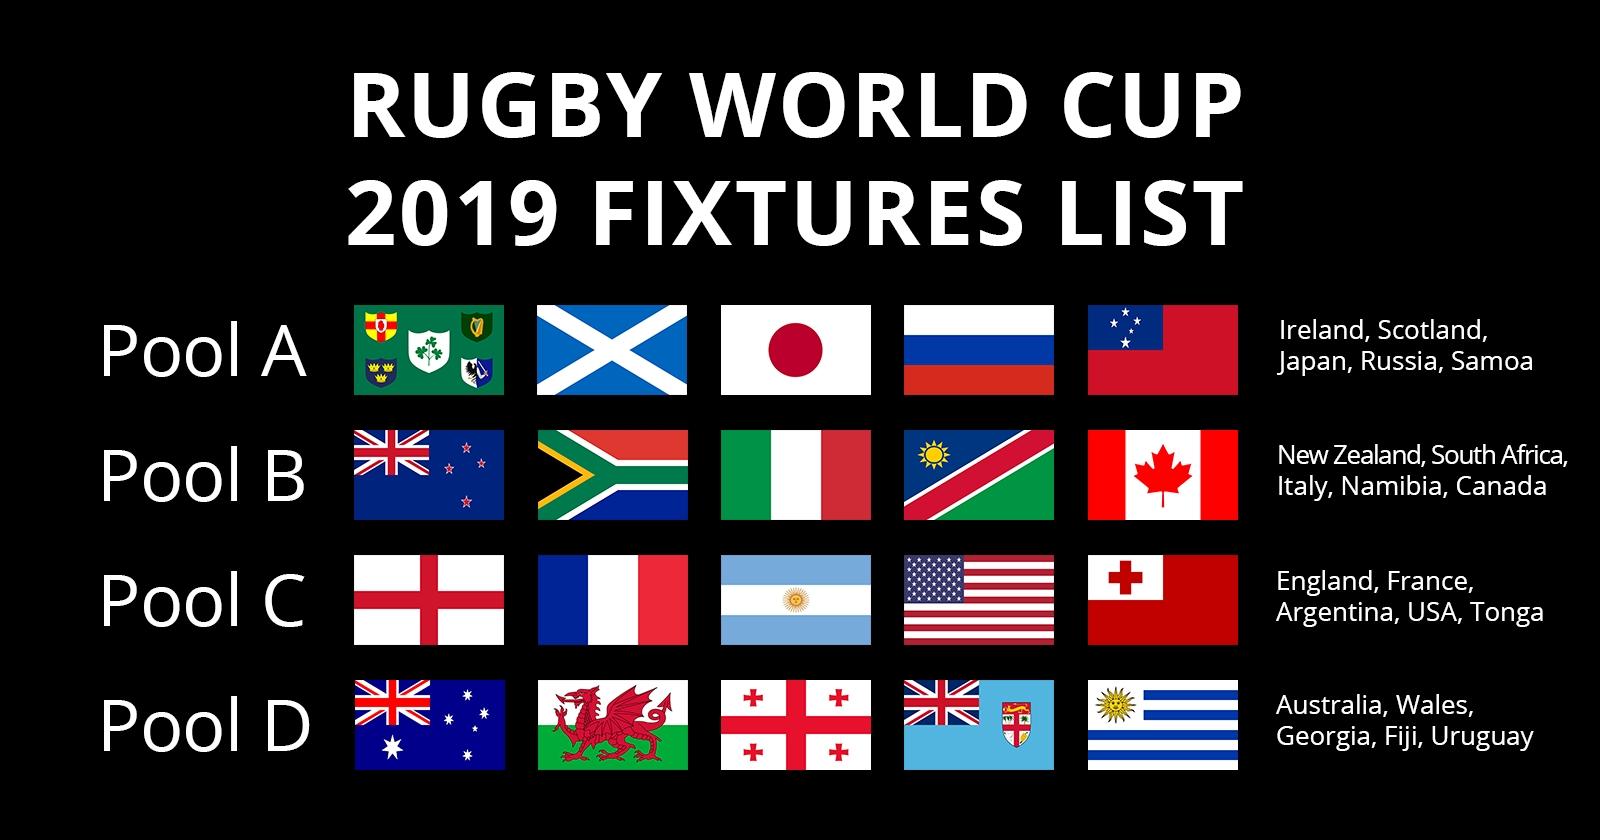 Rugby World Cup 2019 Fixtures   Autumn Internationals 6 Nations Calendar 2019